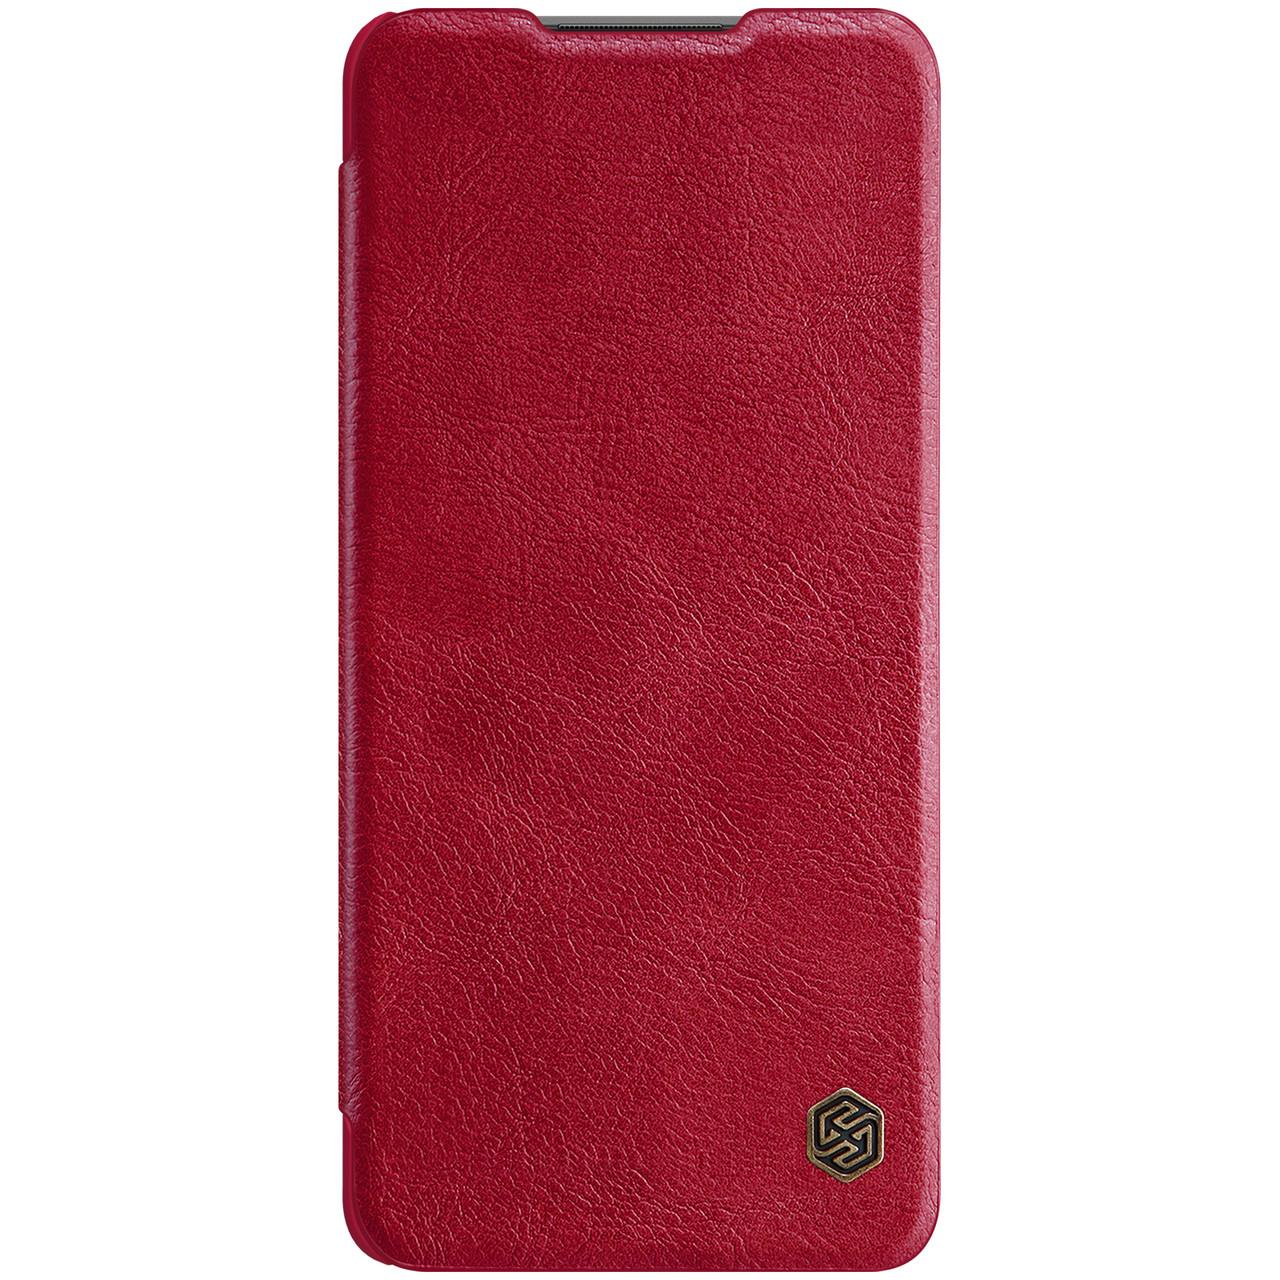 Защитный чехол-книжка Nillkin для Xiaomi Redmi Note 10 Pro / 10 Pro Max Qin leather case Red Красный